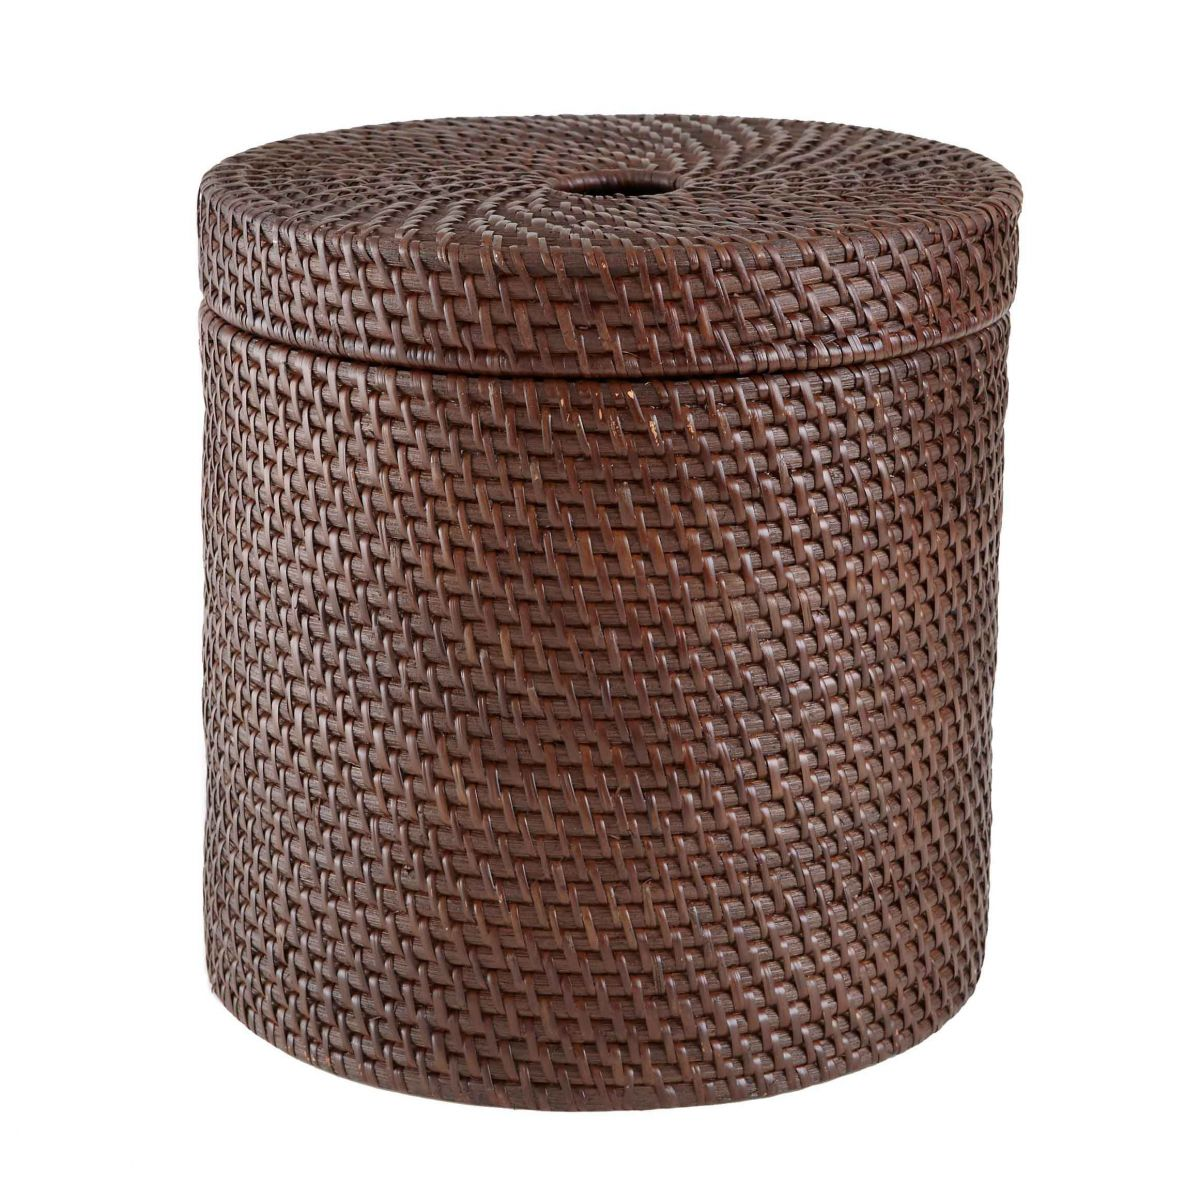 Rattan Basket With Lid # DK31